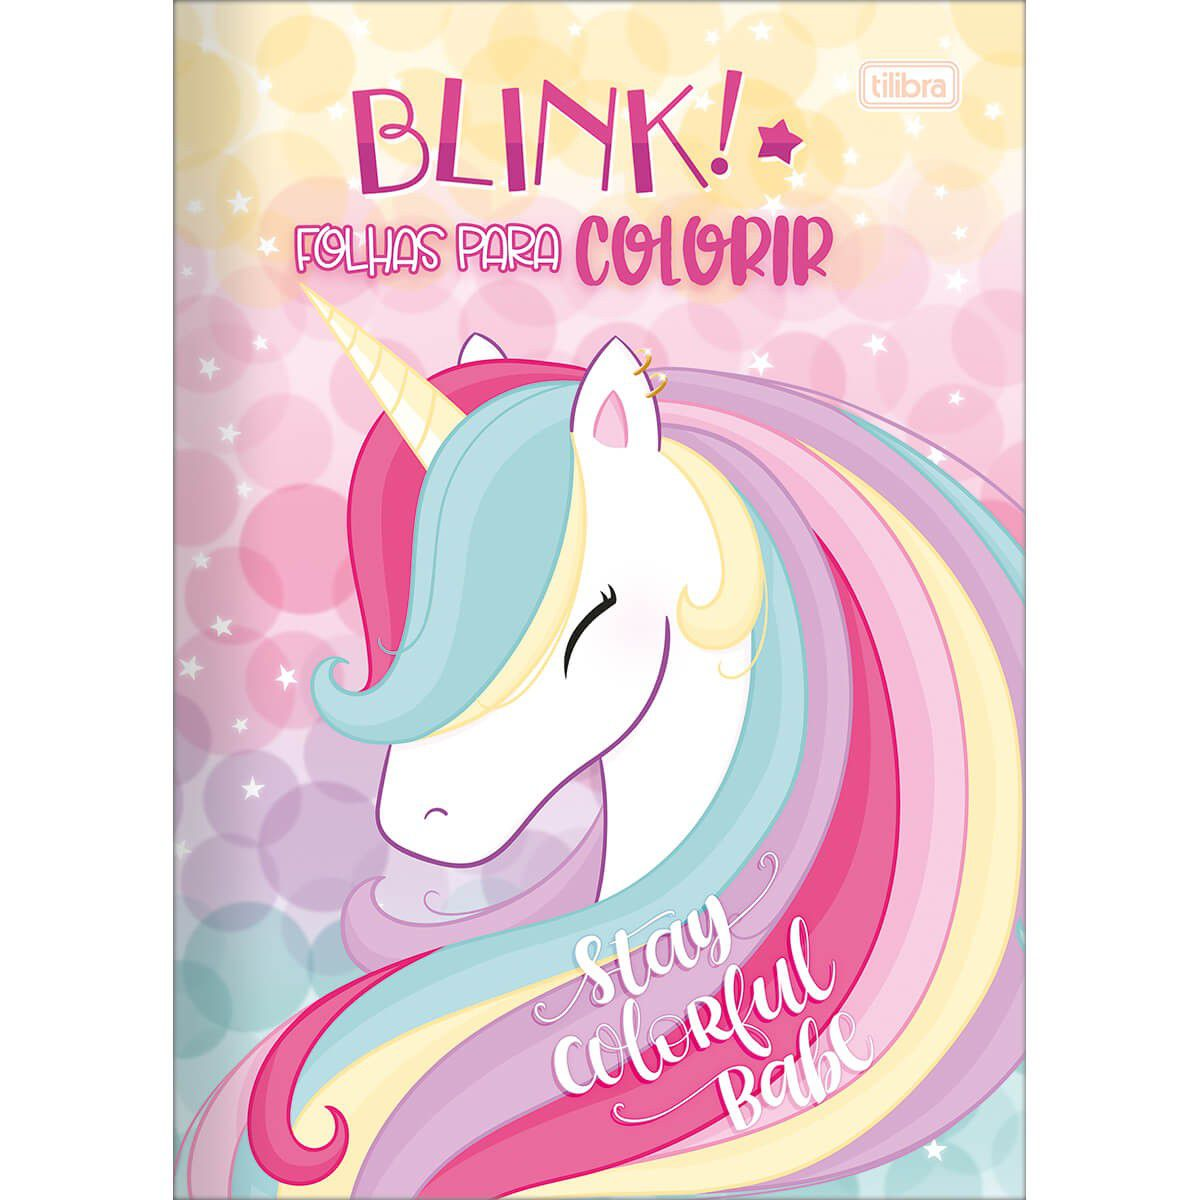 Folhas para Colorir Blink